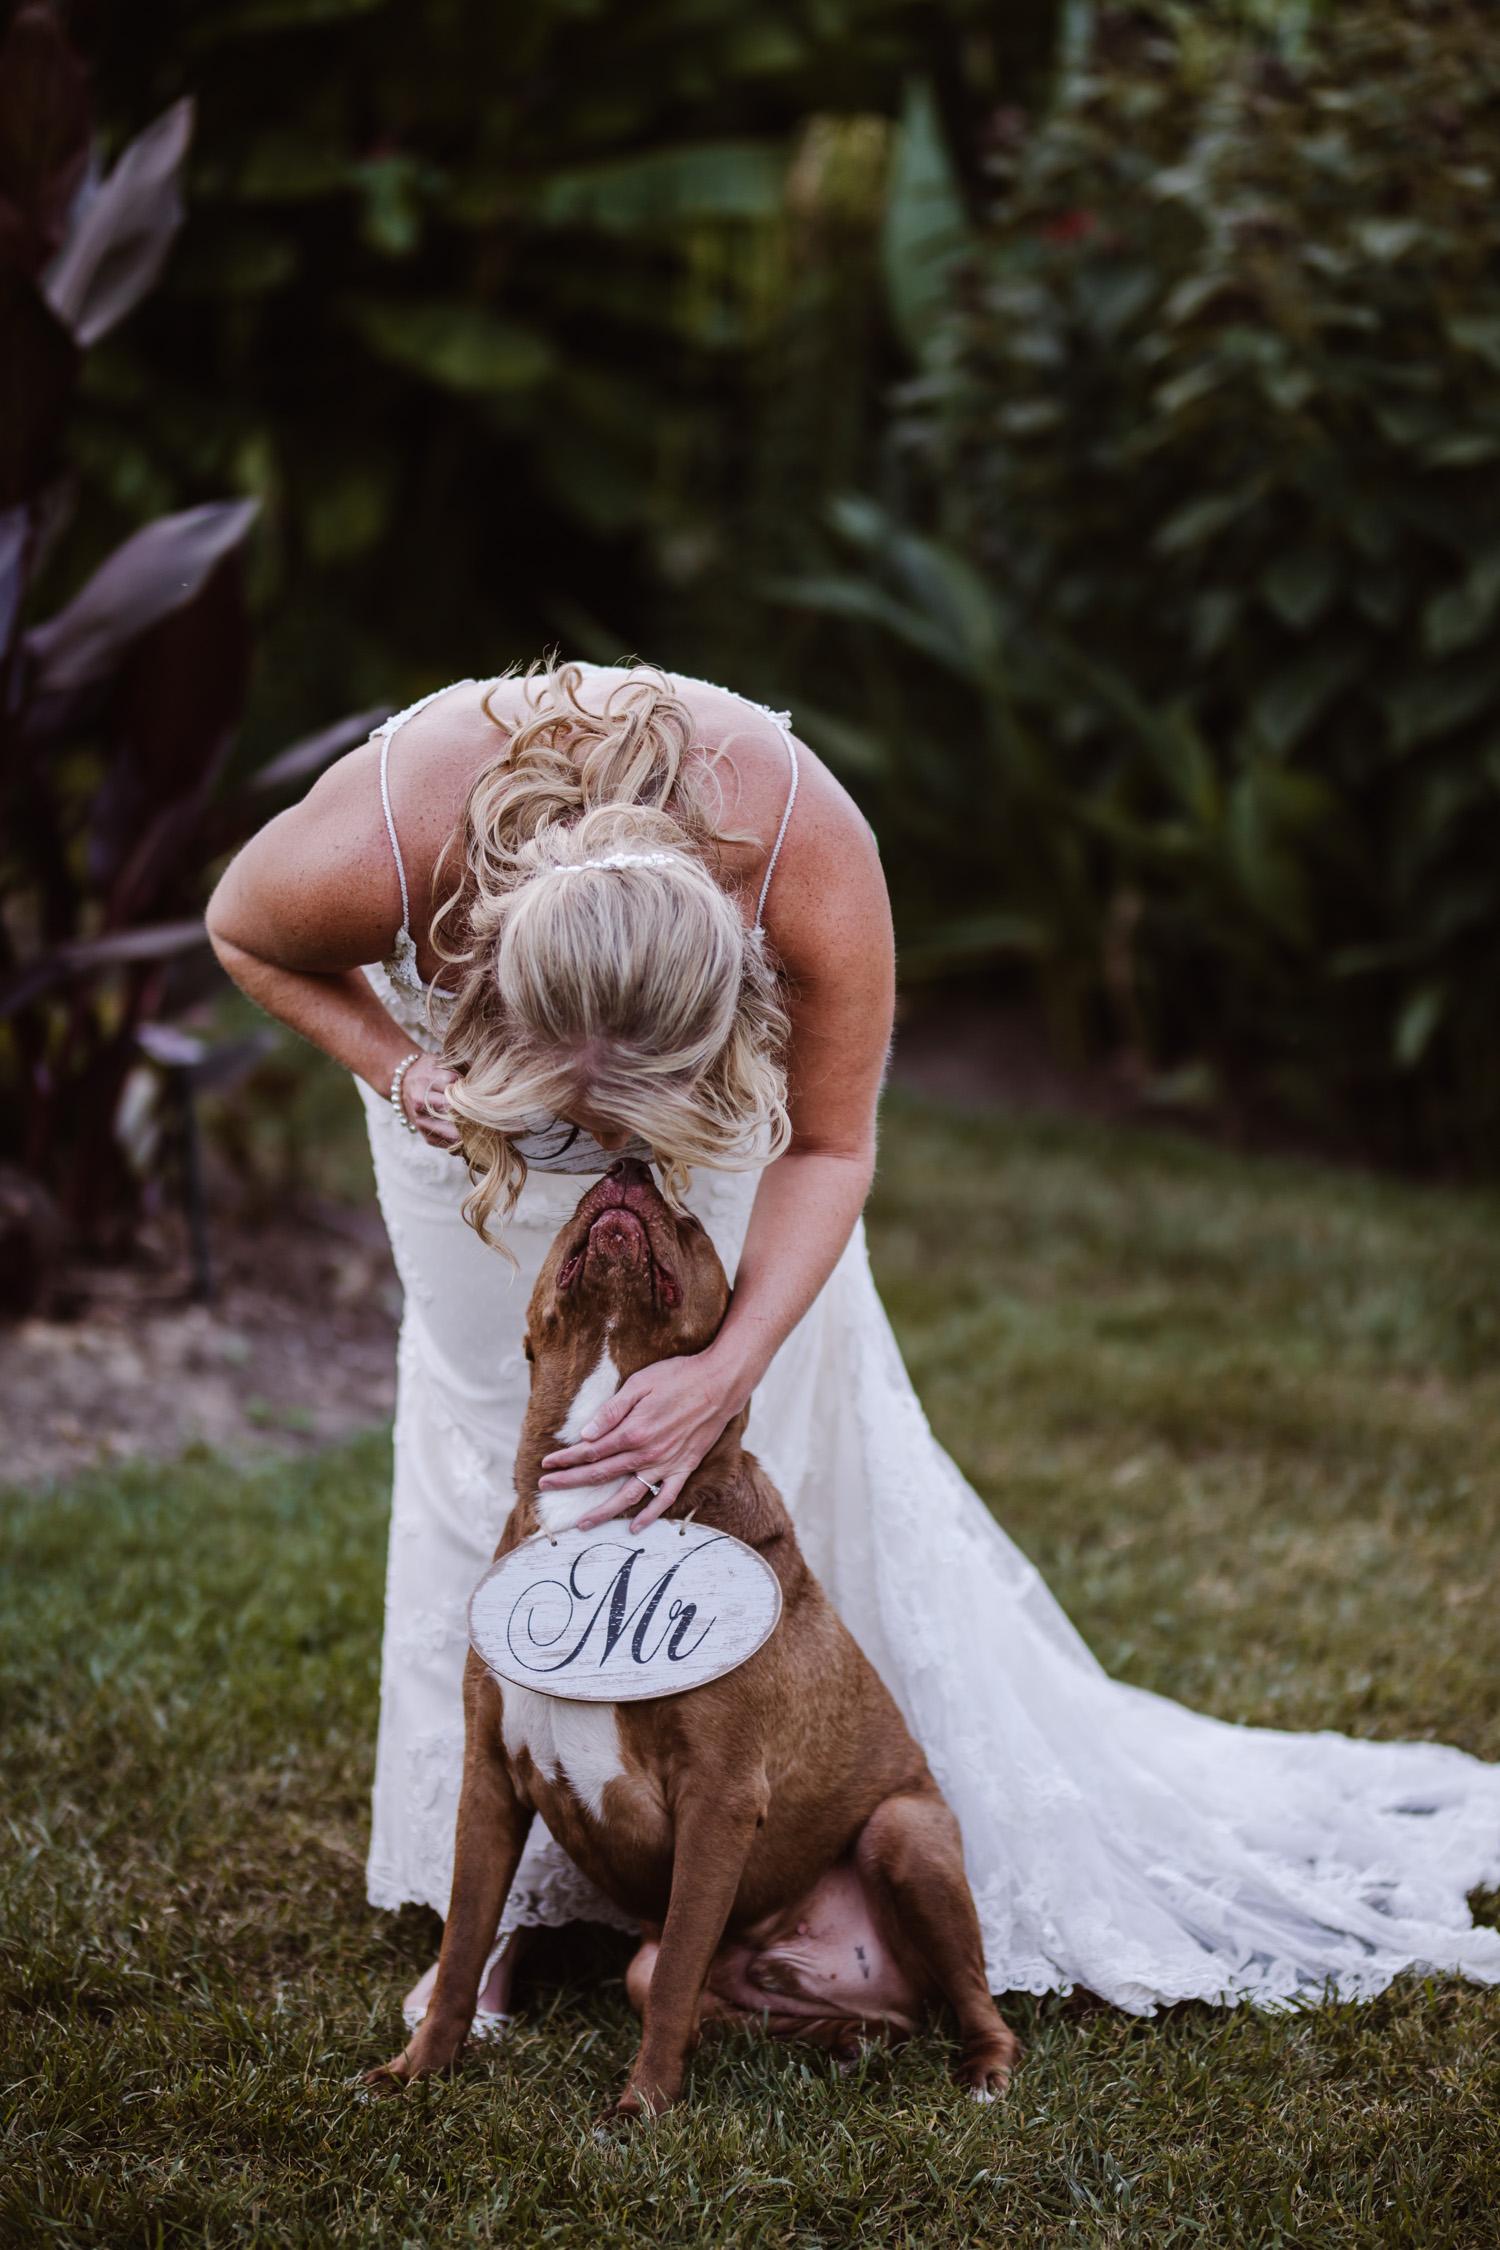 Kristina's garden Bridal Portraits | Triad, NC Wedding Photographer | Kayli LaFon Photography